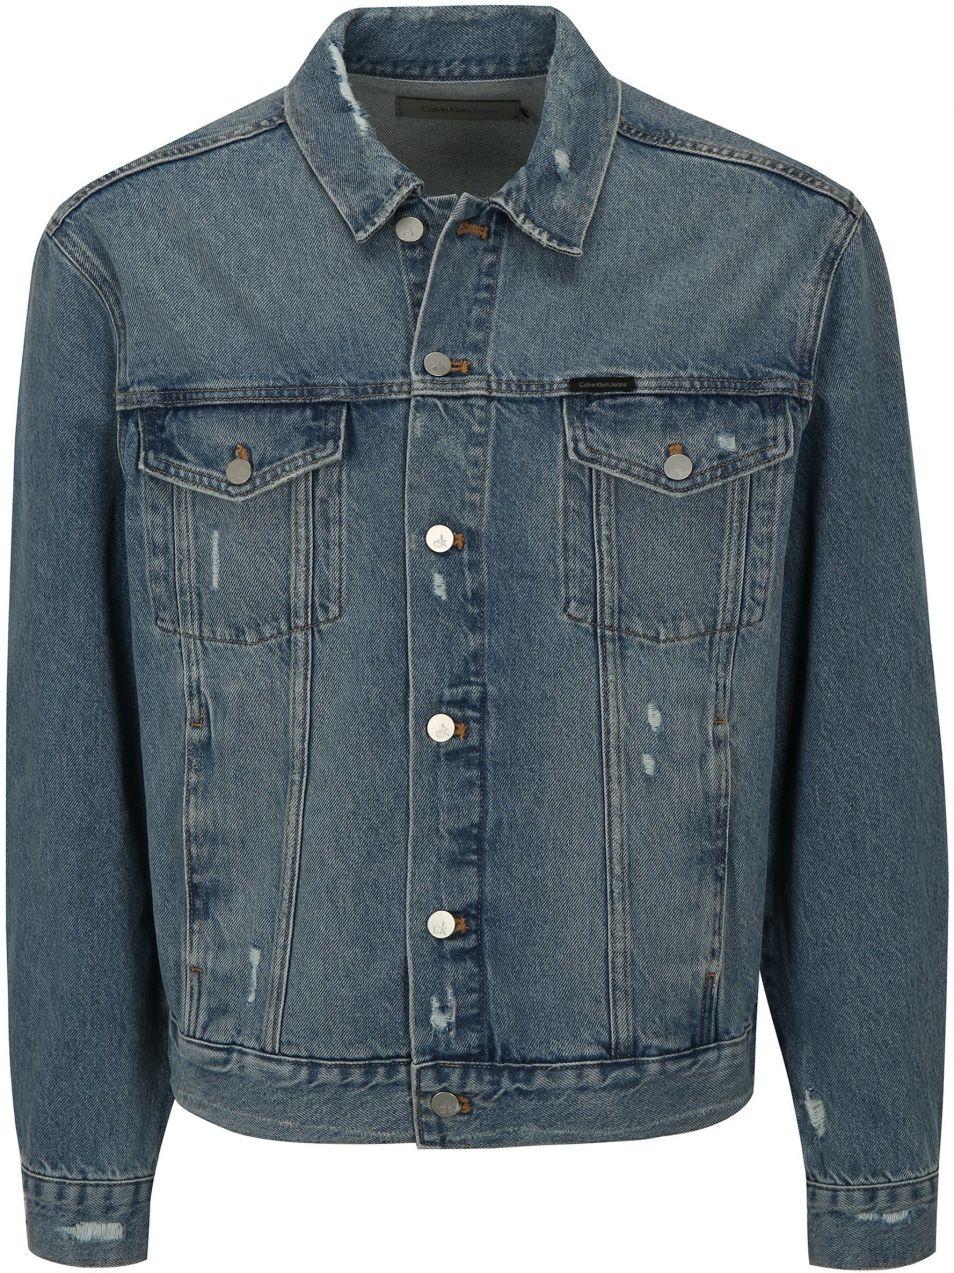 efd23a729 Modrá pánska rifľová bunda Calvin Klein Jeans značky Calvin Klein Jeans -  Lovely.sk